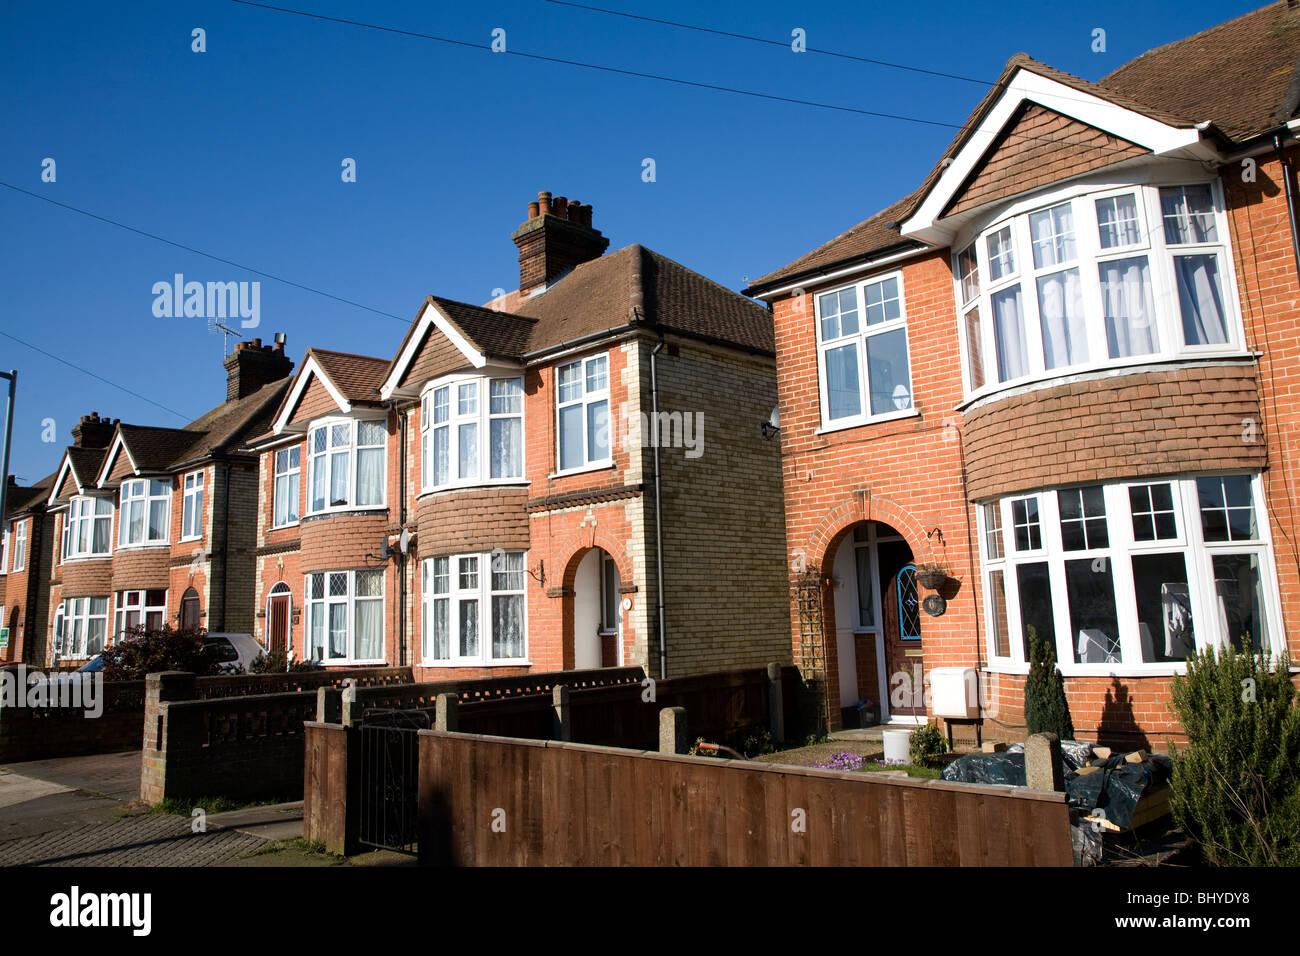 Inter war 1930s semi detached housing with bay windows Ipswich Suffolk England - Stock Image